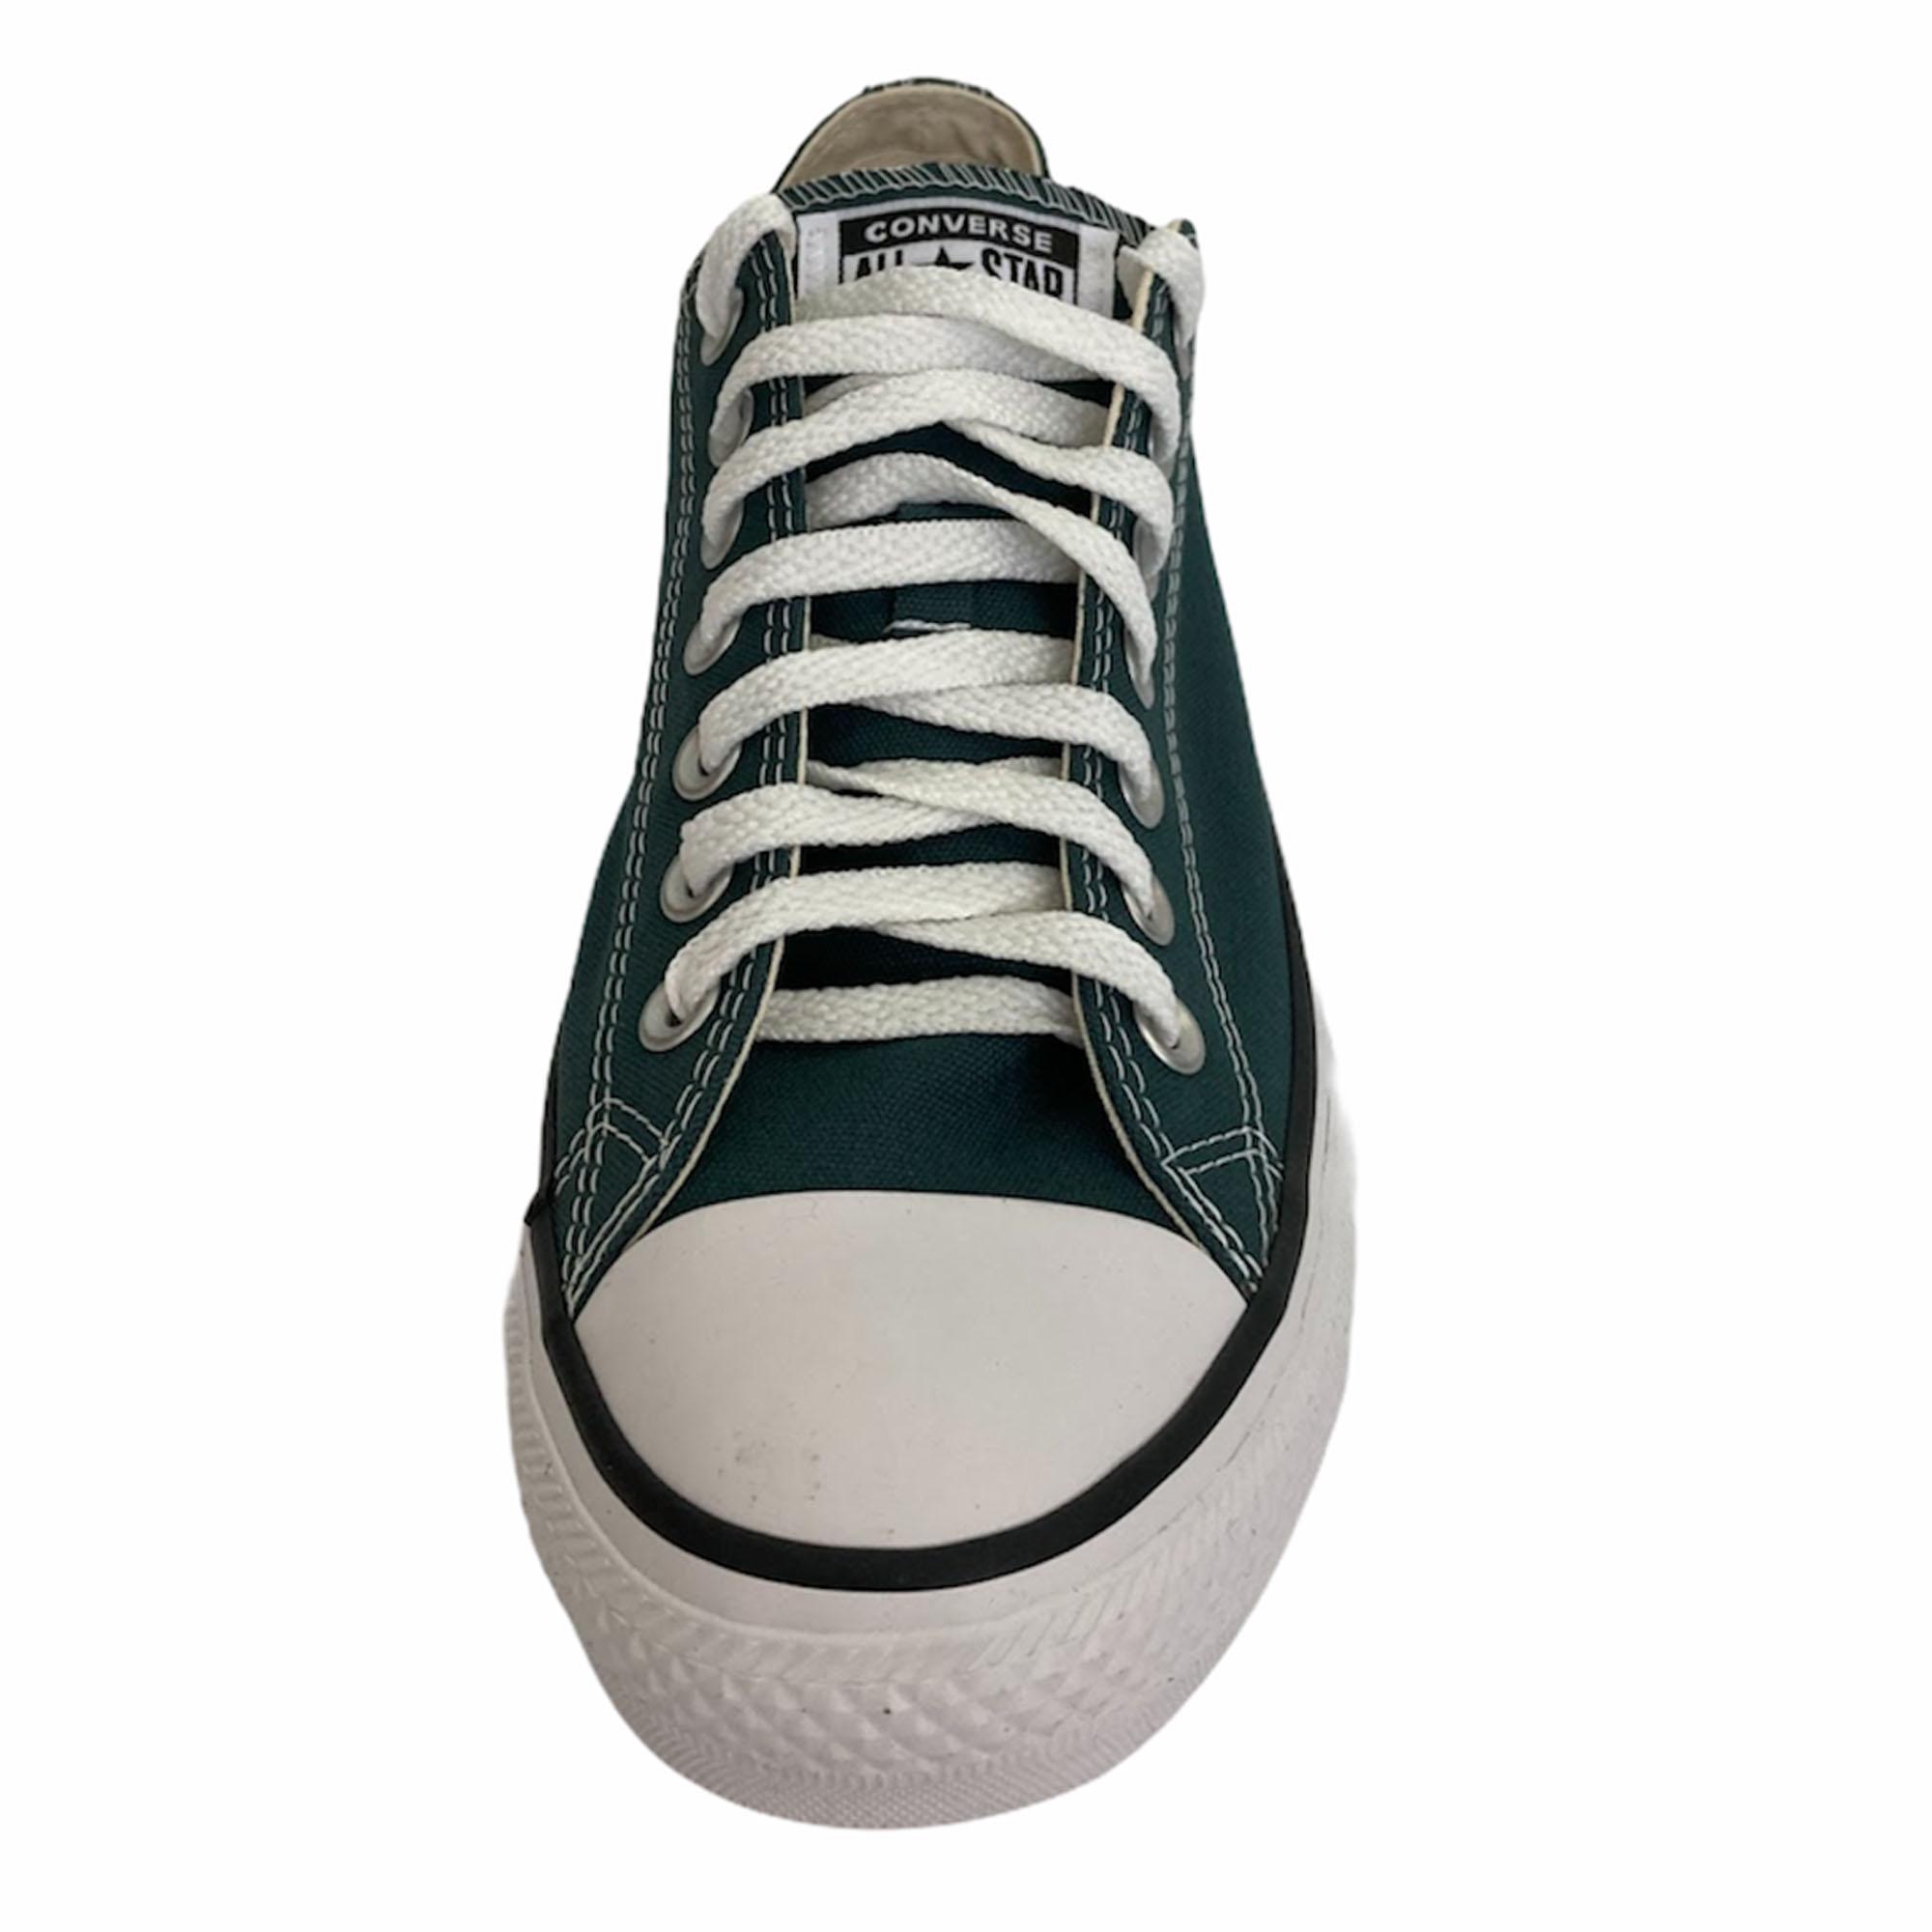 Tênis Converse Chuck Taylor All Star Ox Verde Escuro